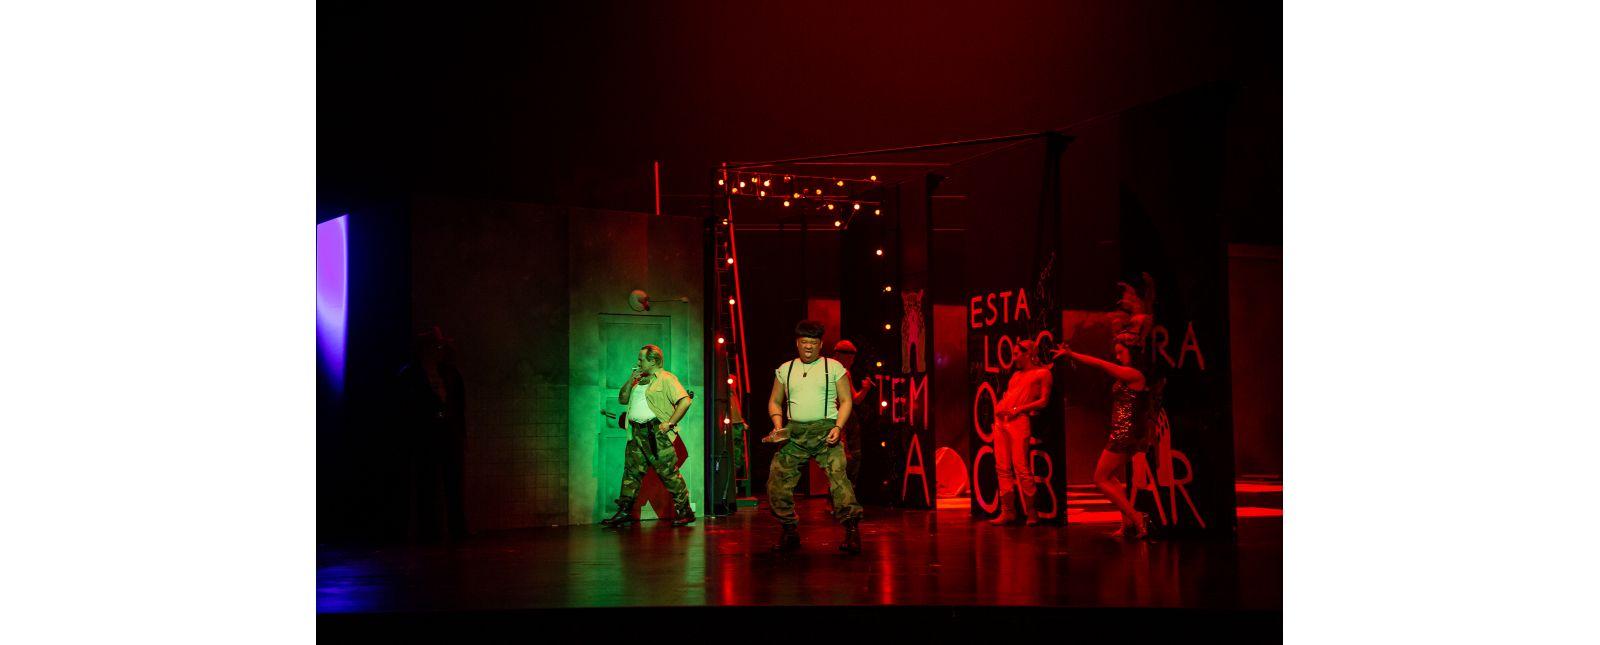 DIDO UND AENEAS // Roberto Gionfriddo / Junbum Lee / Pascal Hufschmid / Janina Staub / Statisterie Theater Freiburg // Foto: Laura Nickel